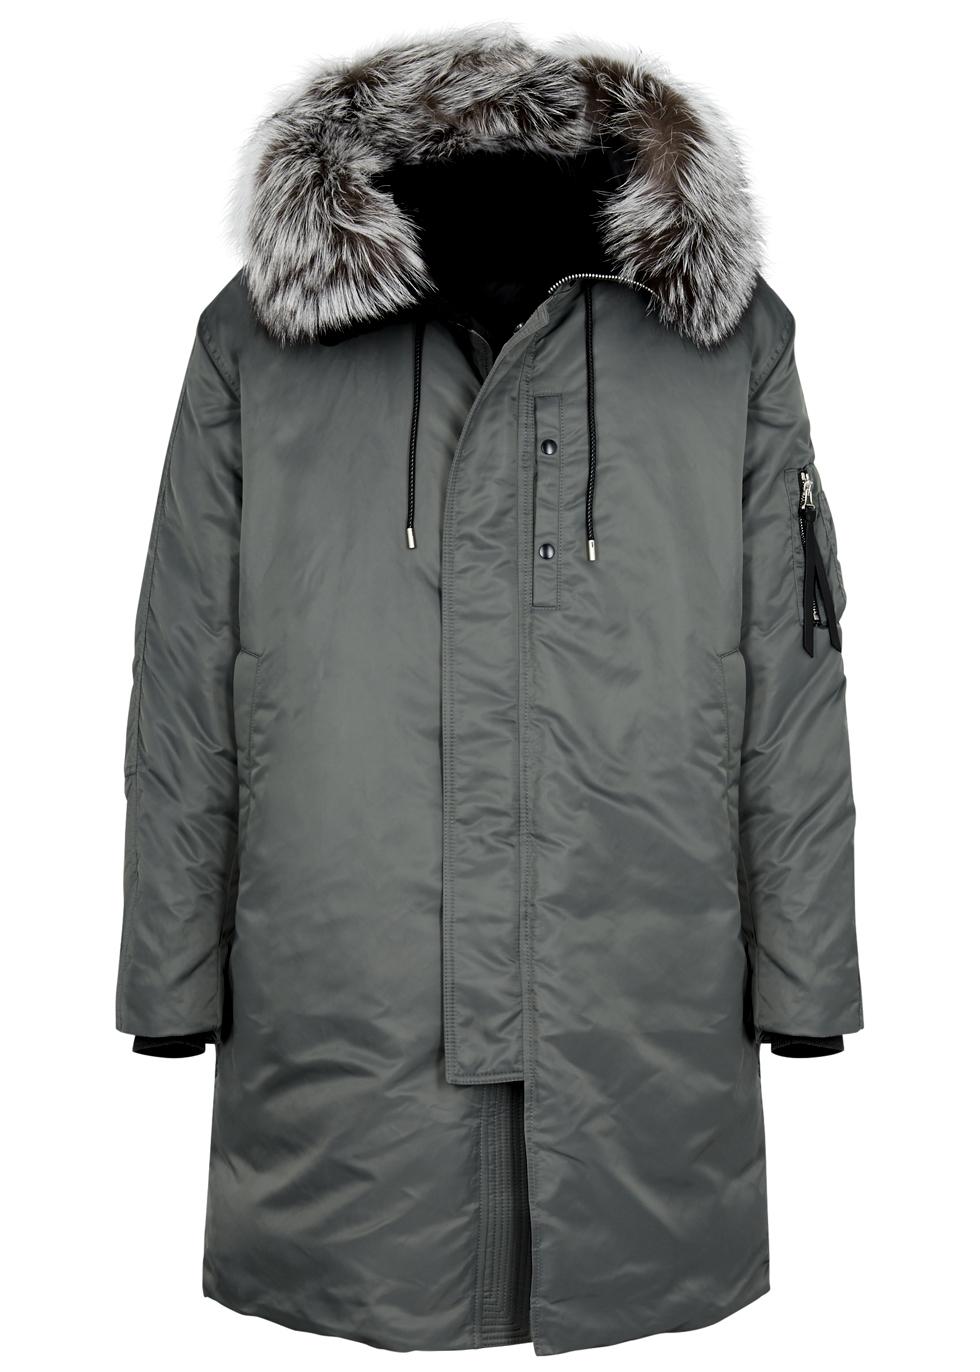 SOLID HOMME DARK GREY FUR-TRIMMED SHELL COAT